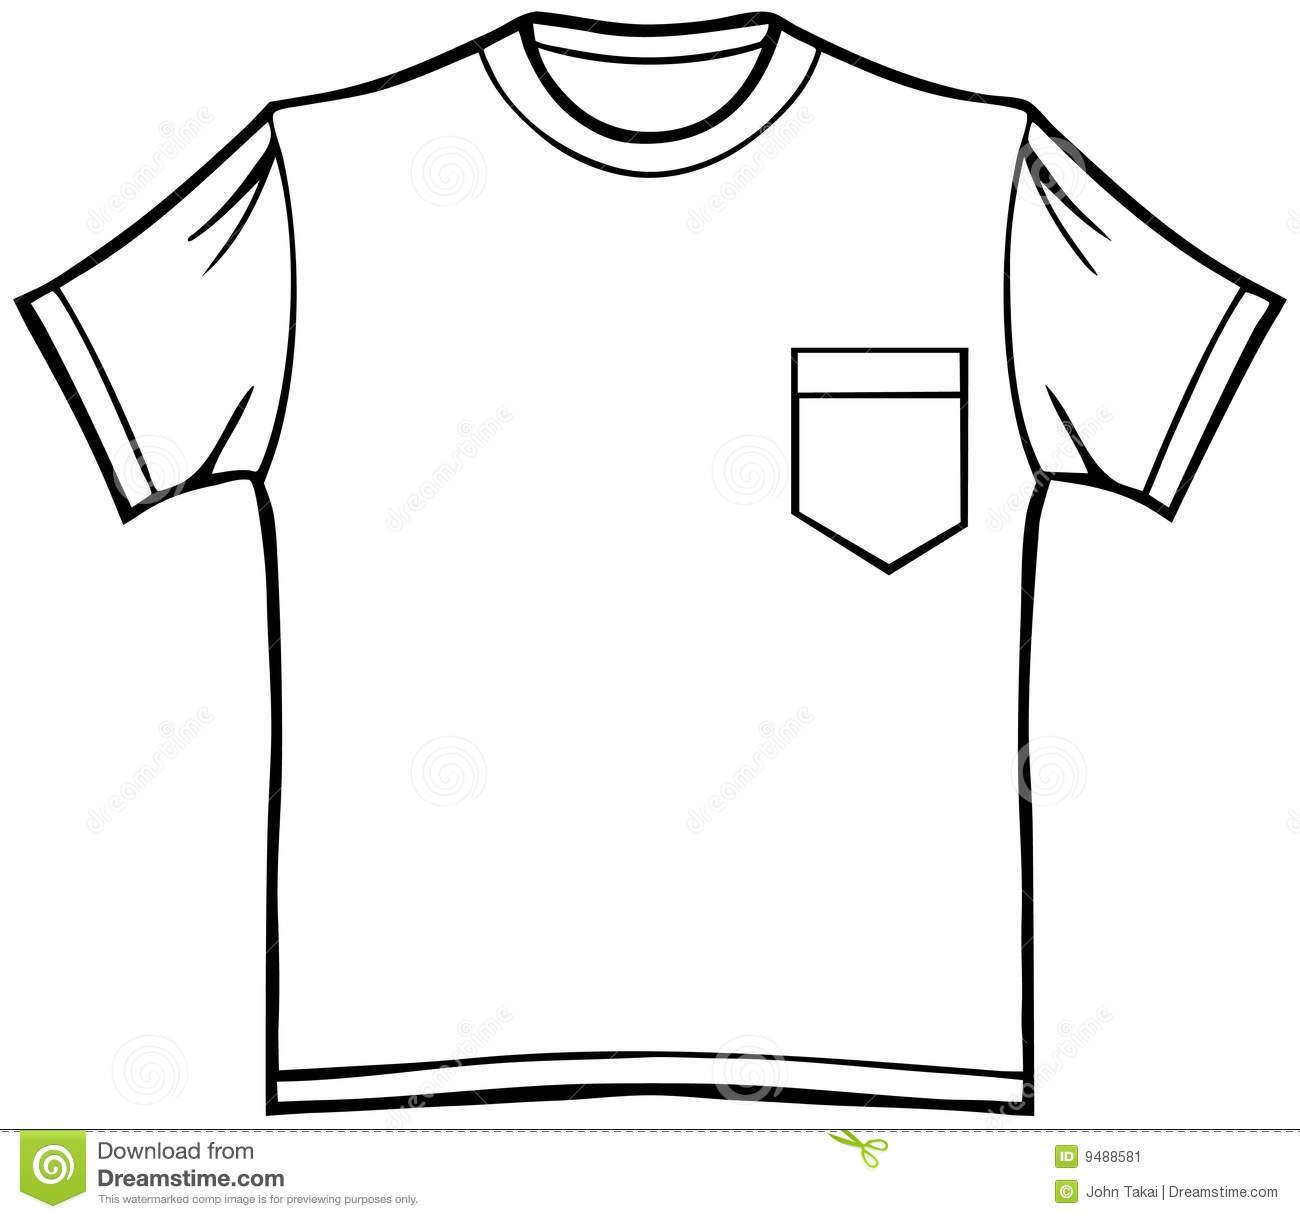 Shirt pocket clipart 1 » Clipart Station.